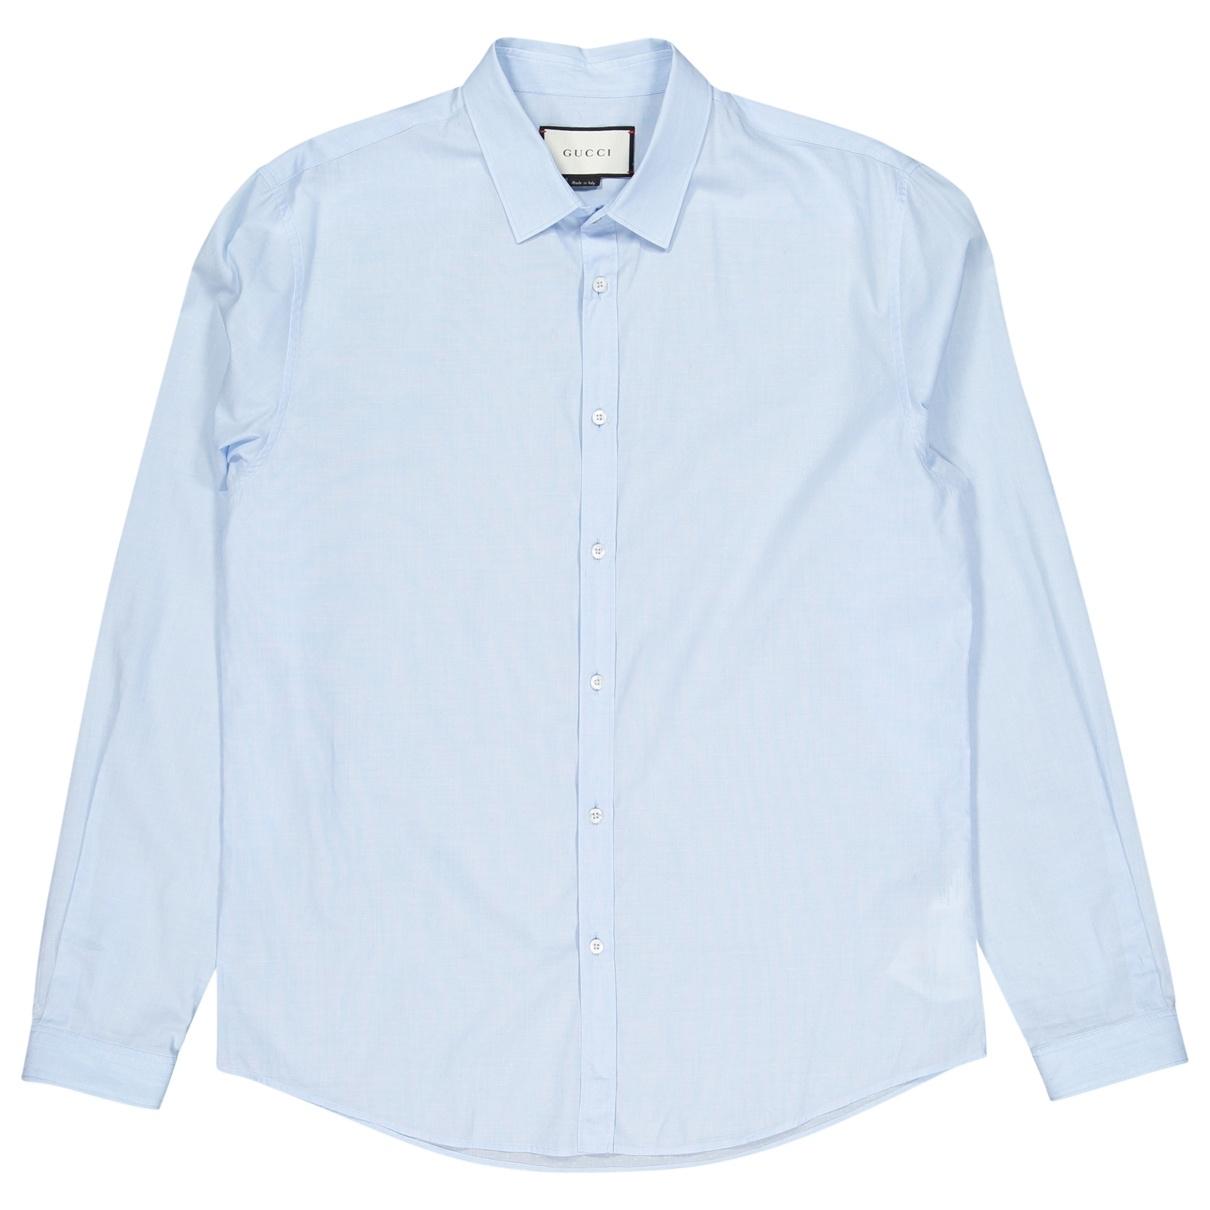 Gucci \N Blue Cotton Shirts for Men 42 EU (tour de cou / collar)